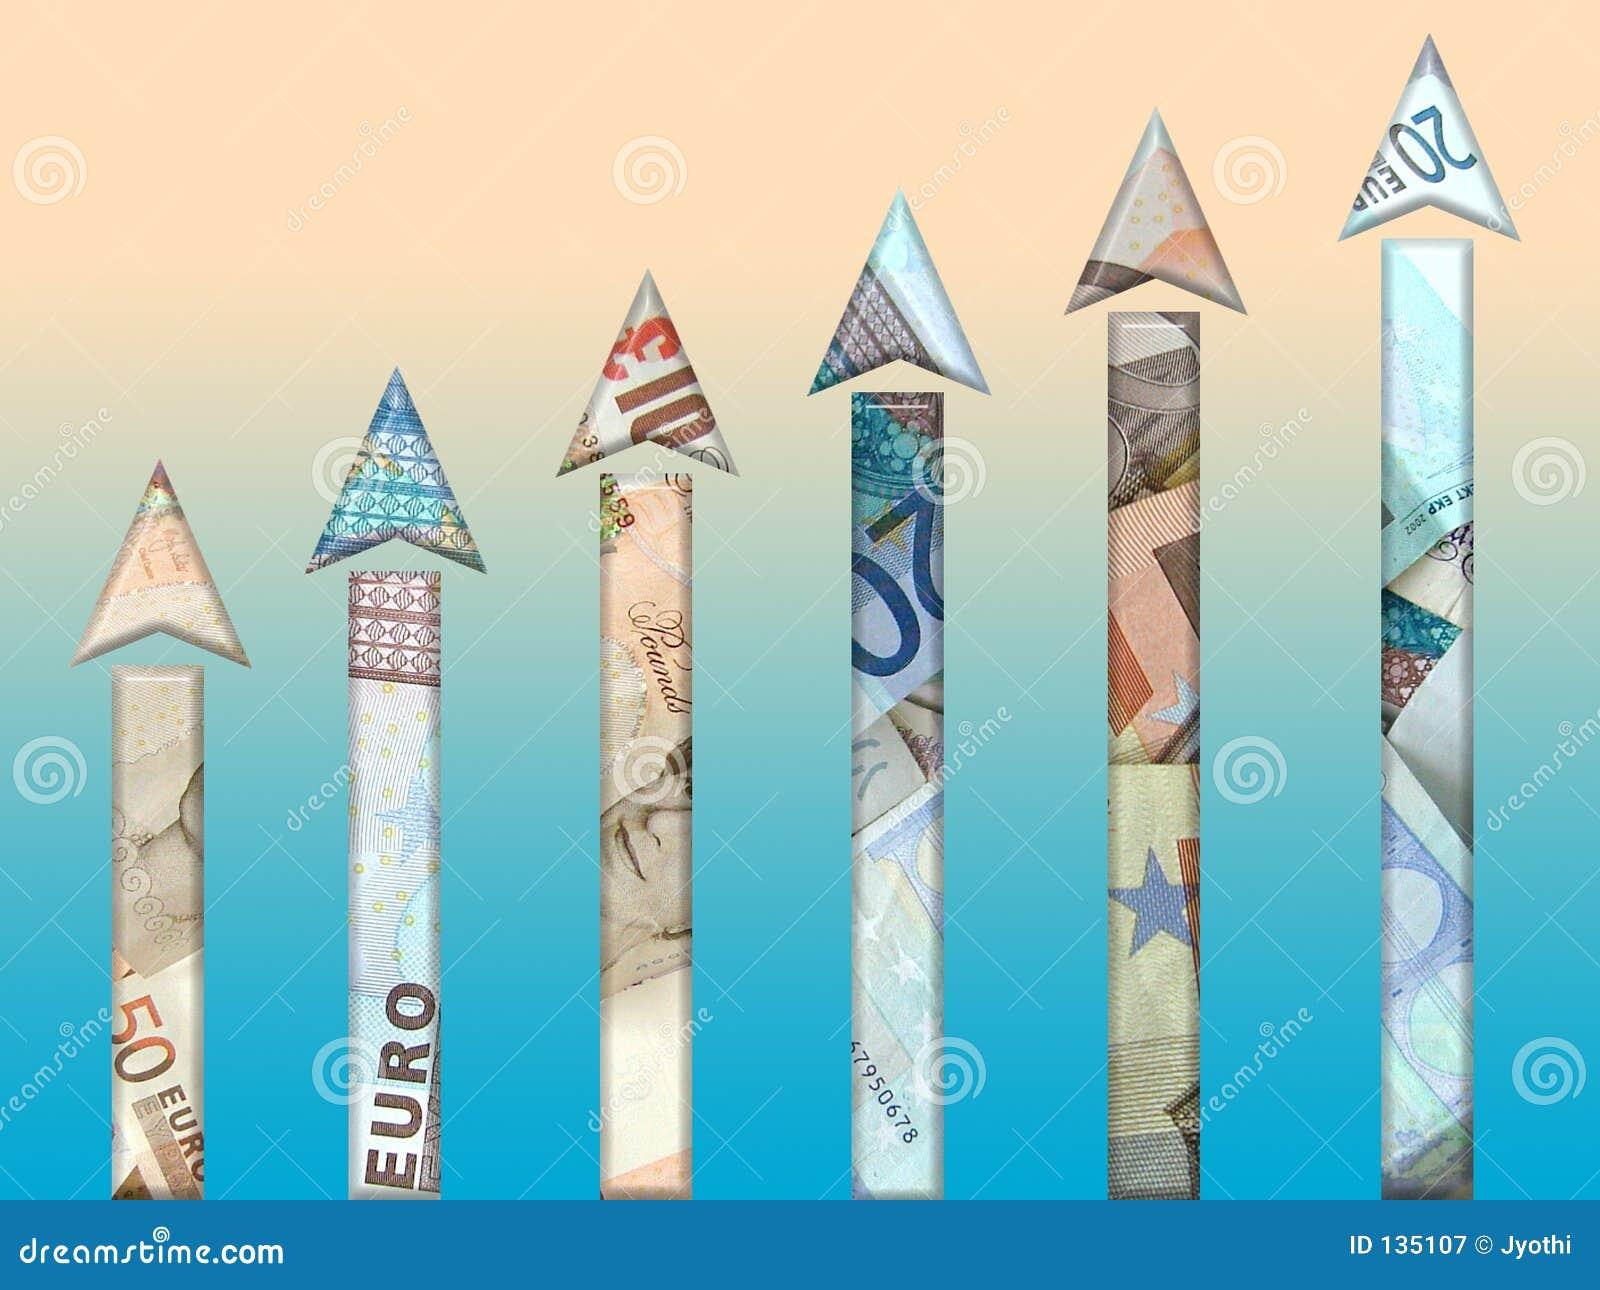 Money Growth Chart Rebellions